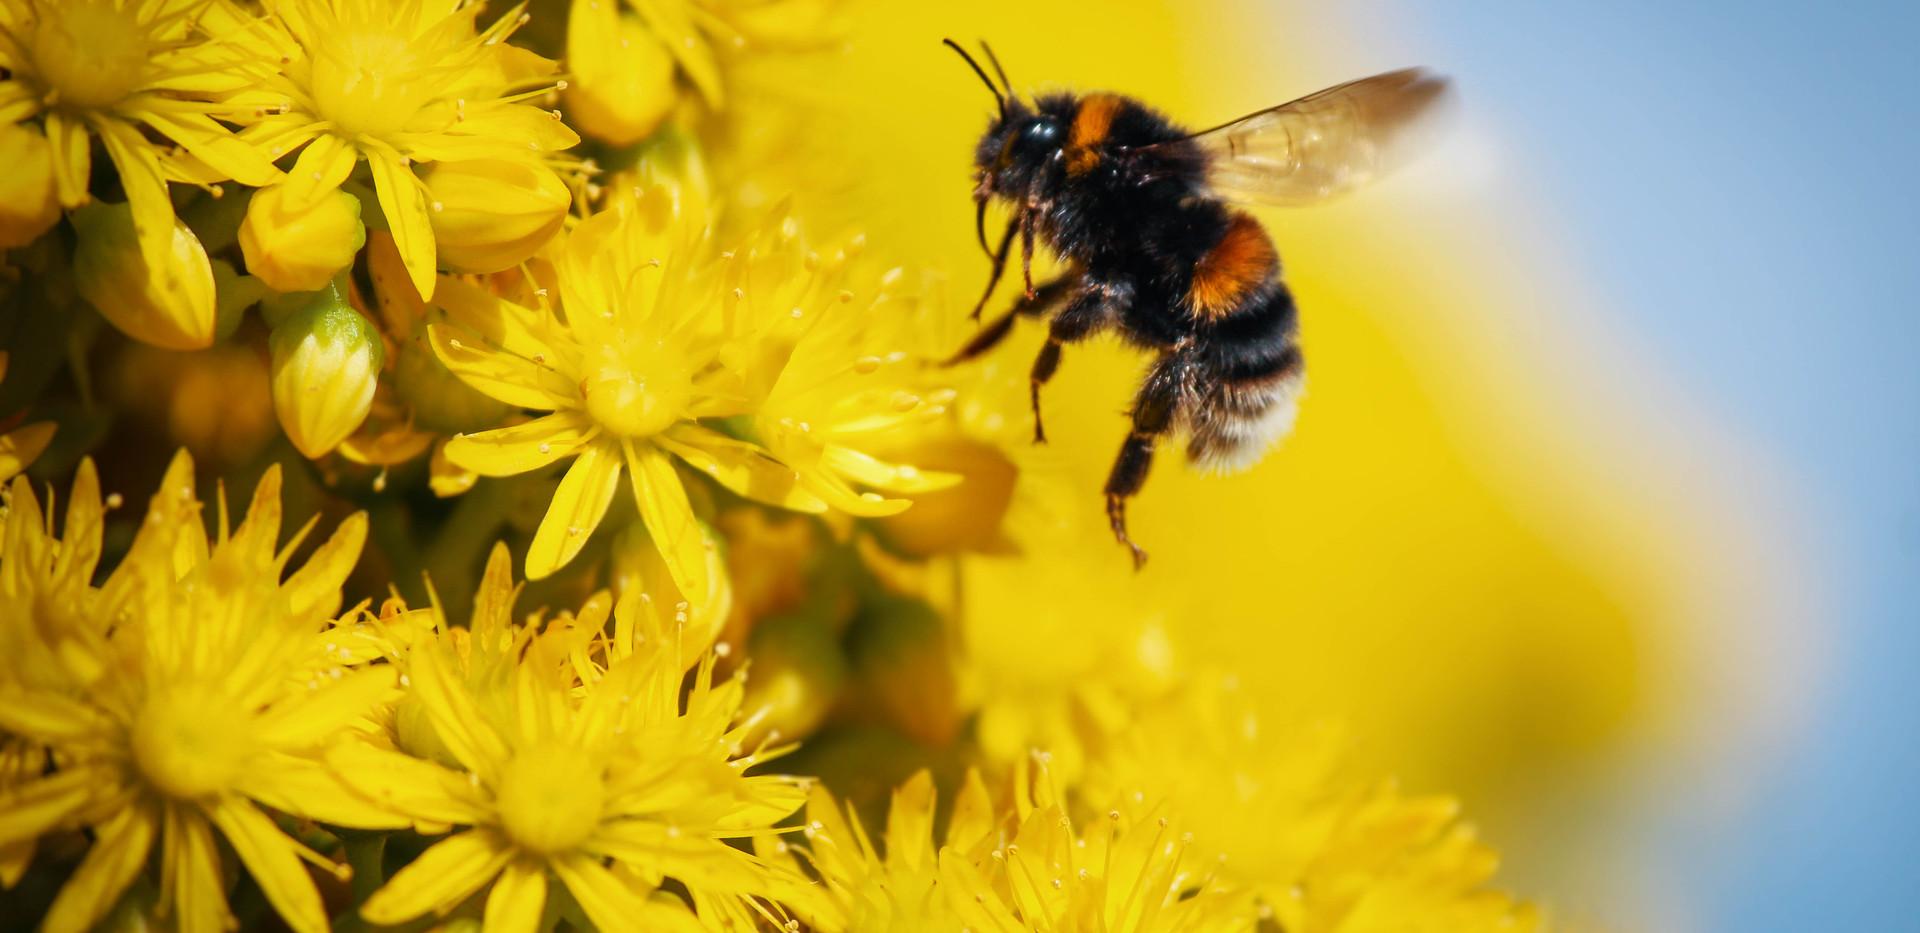 Honey Bee by Celeste Fontein